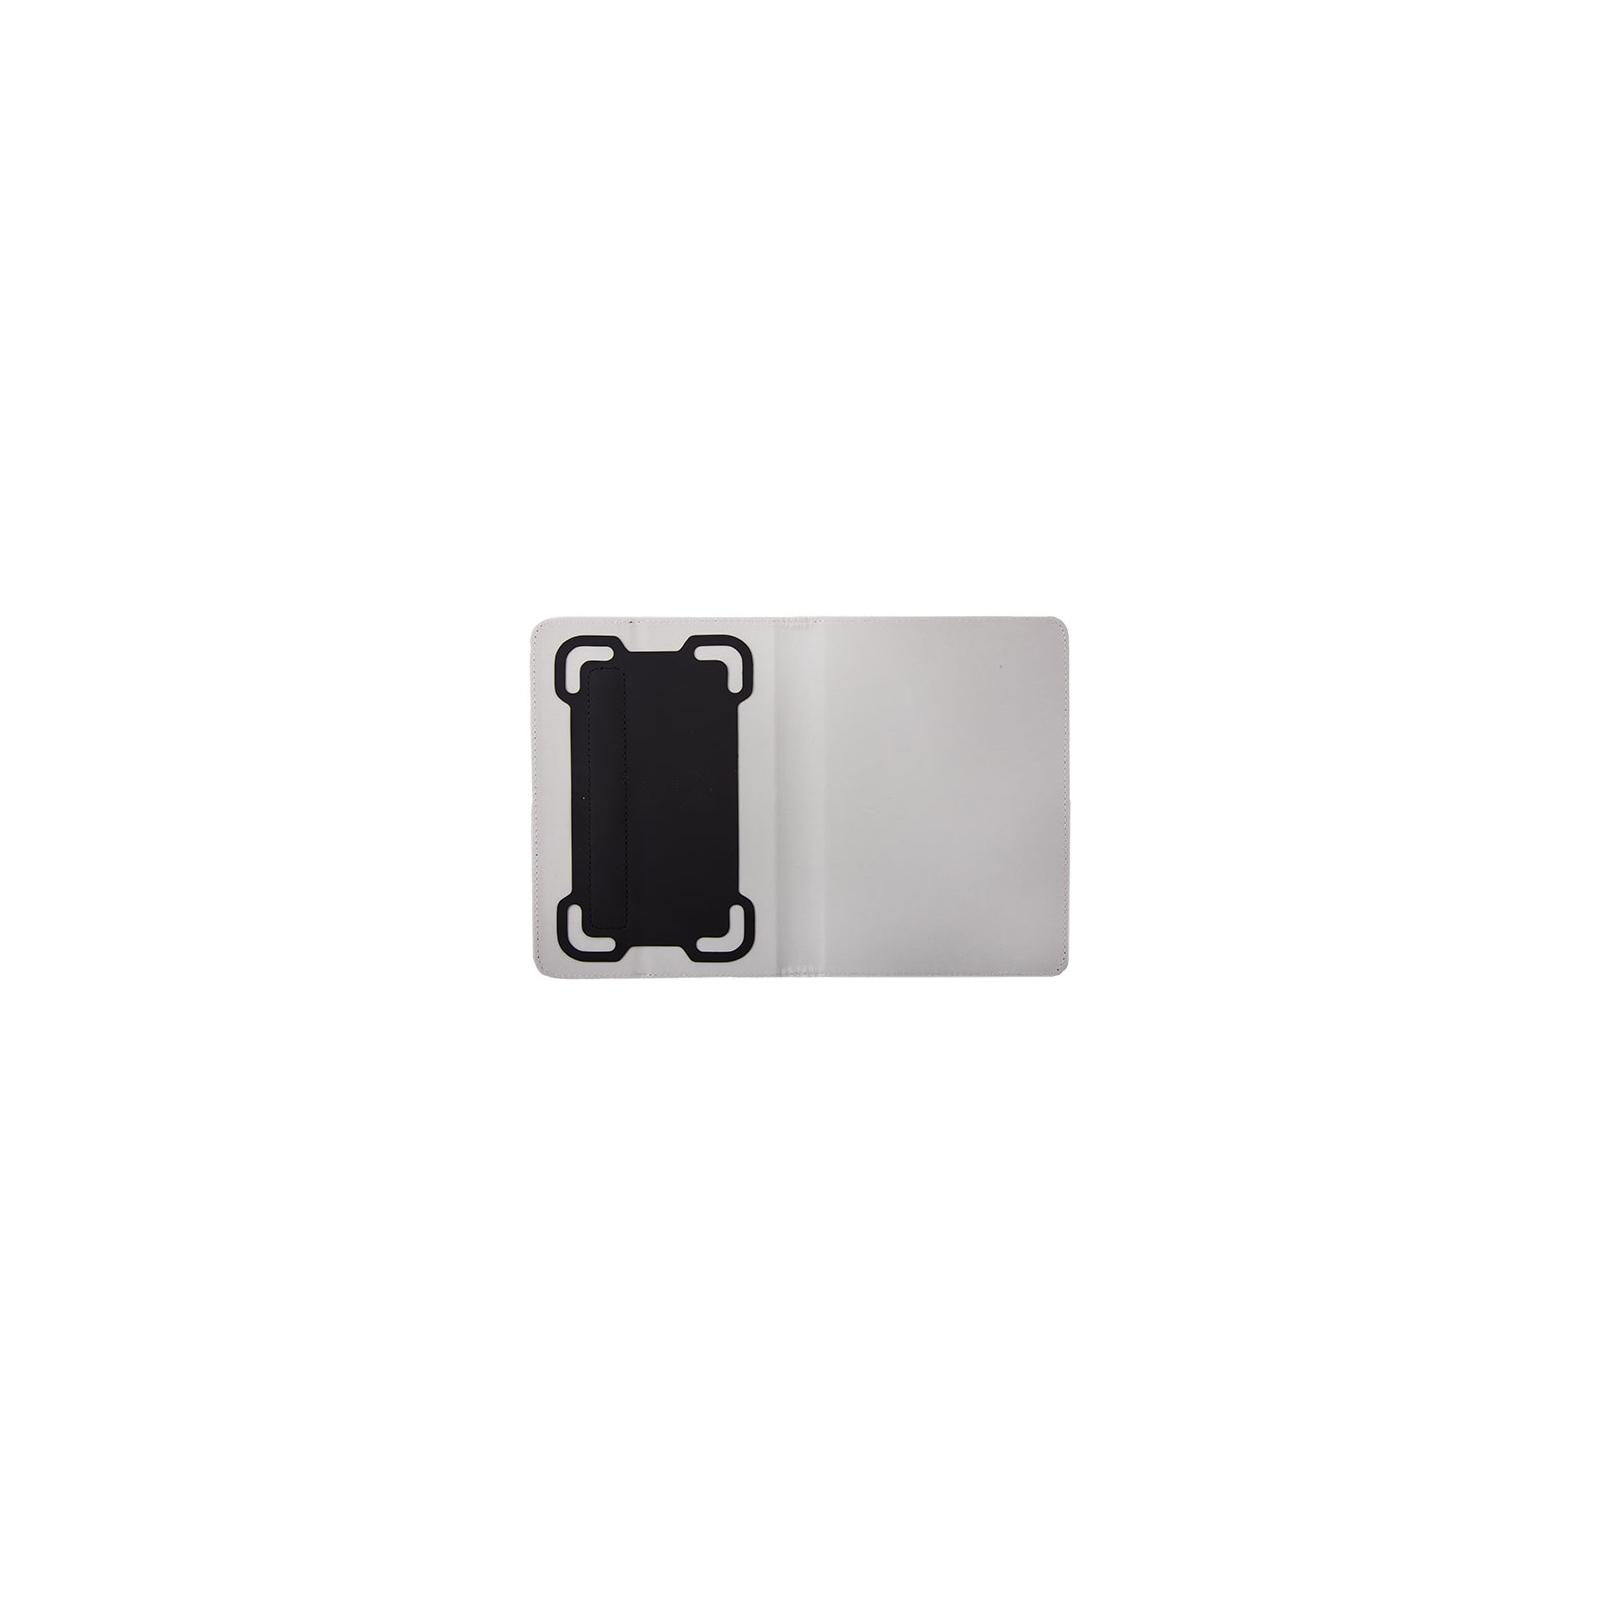 "Чехол для планшета Drobak 7"" Universal stand Black (216879) изображение 2"